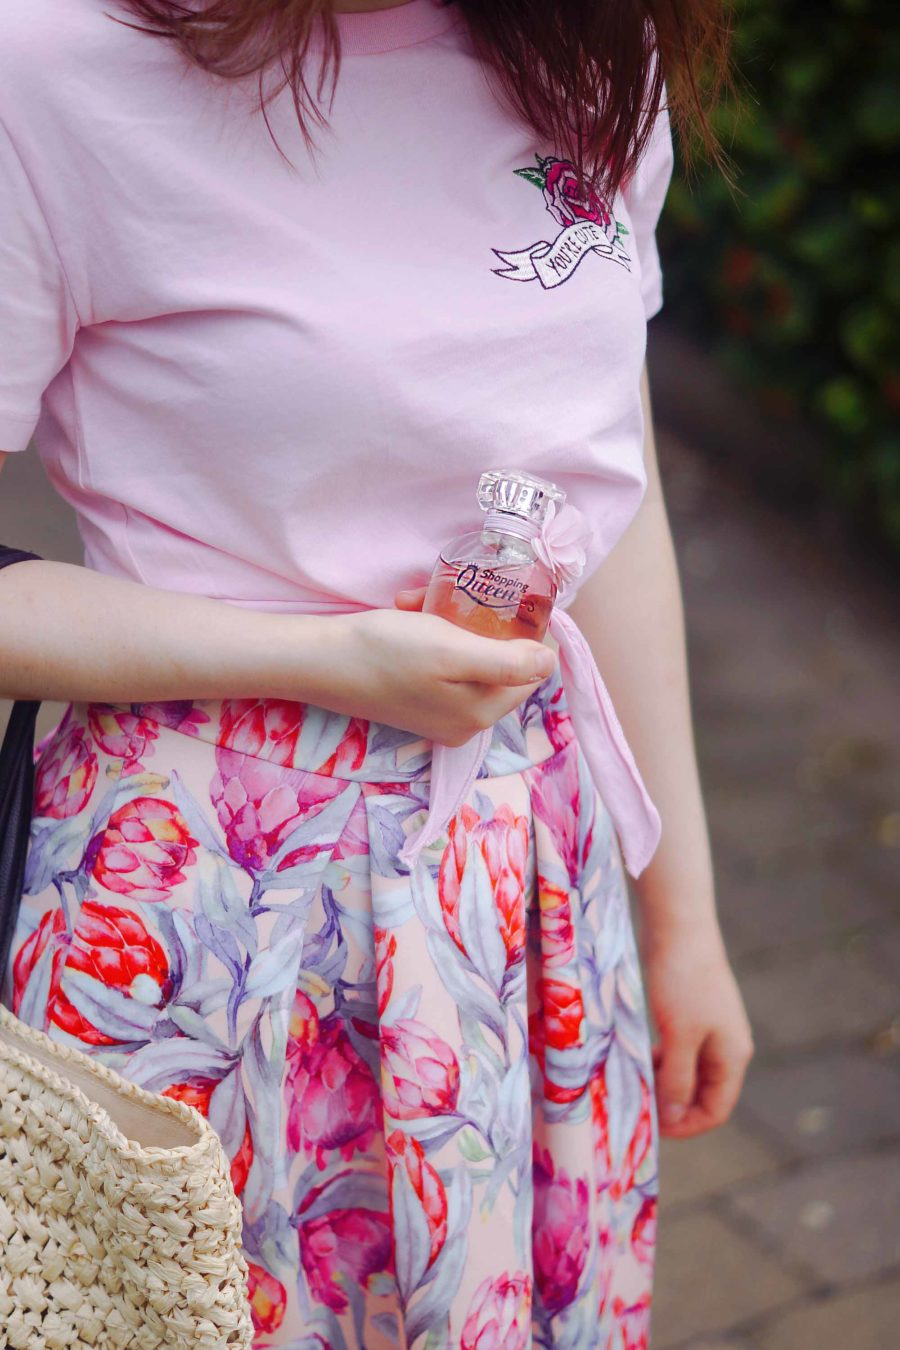 Shopping-Queen-Queen-Of-the-Day-parfum-duft